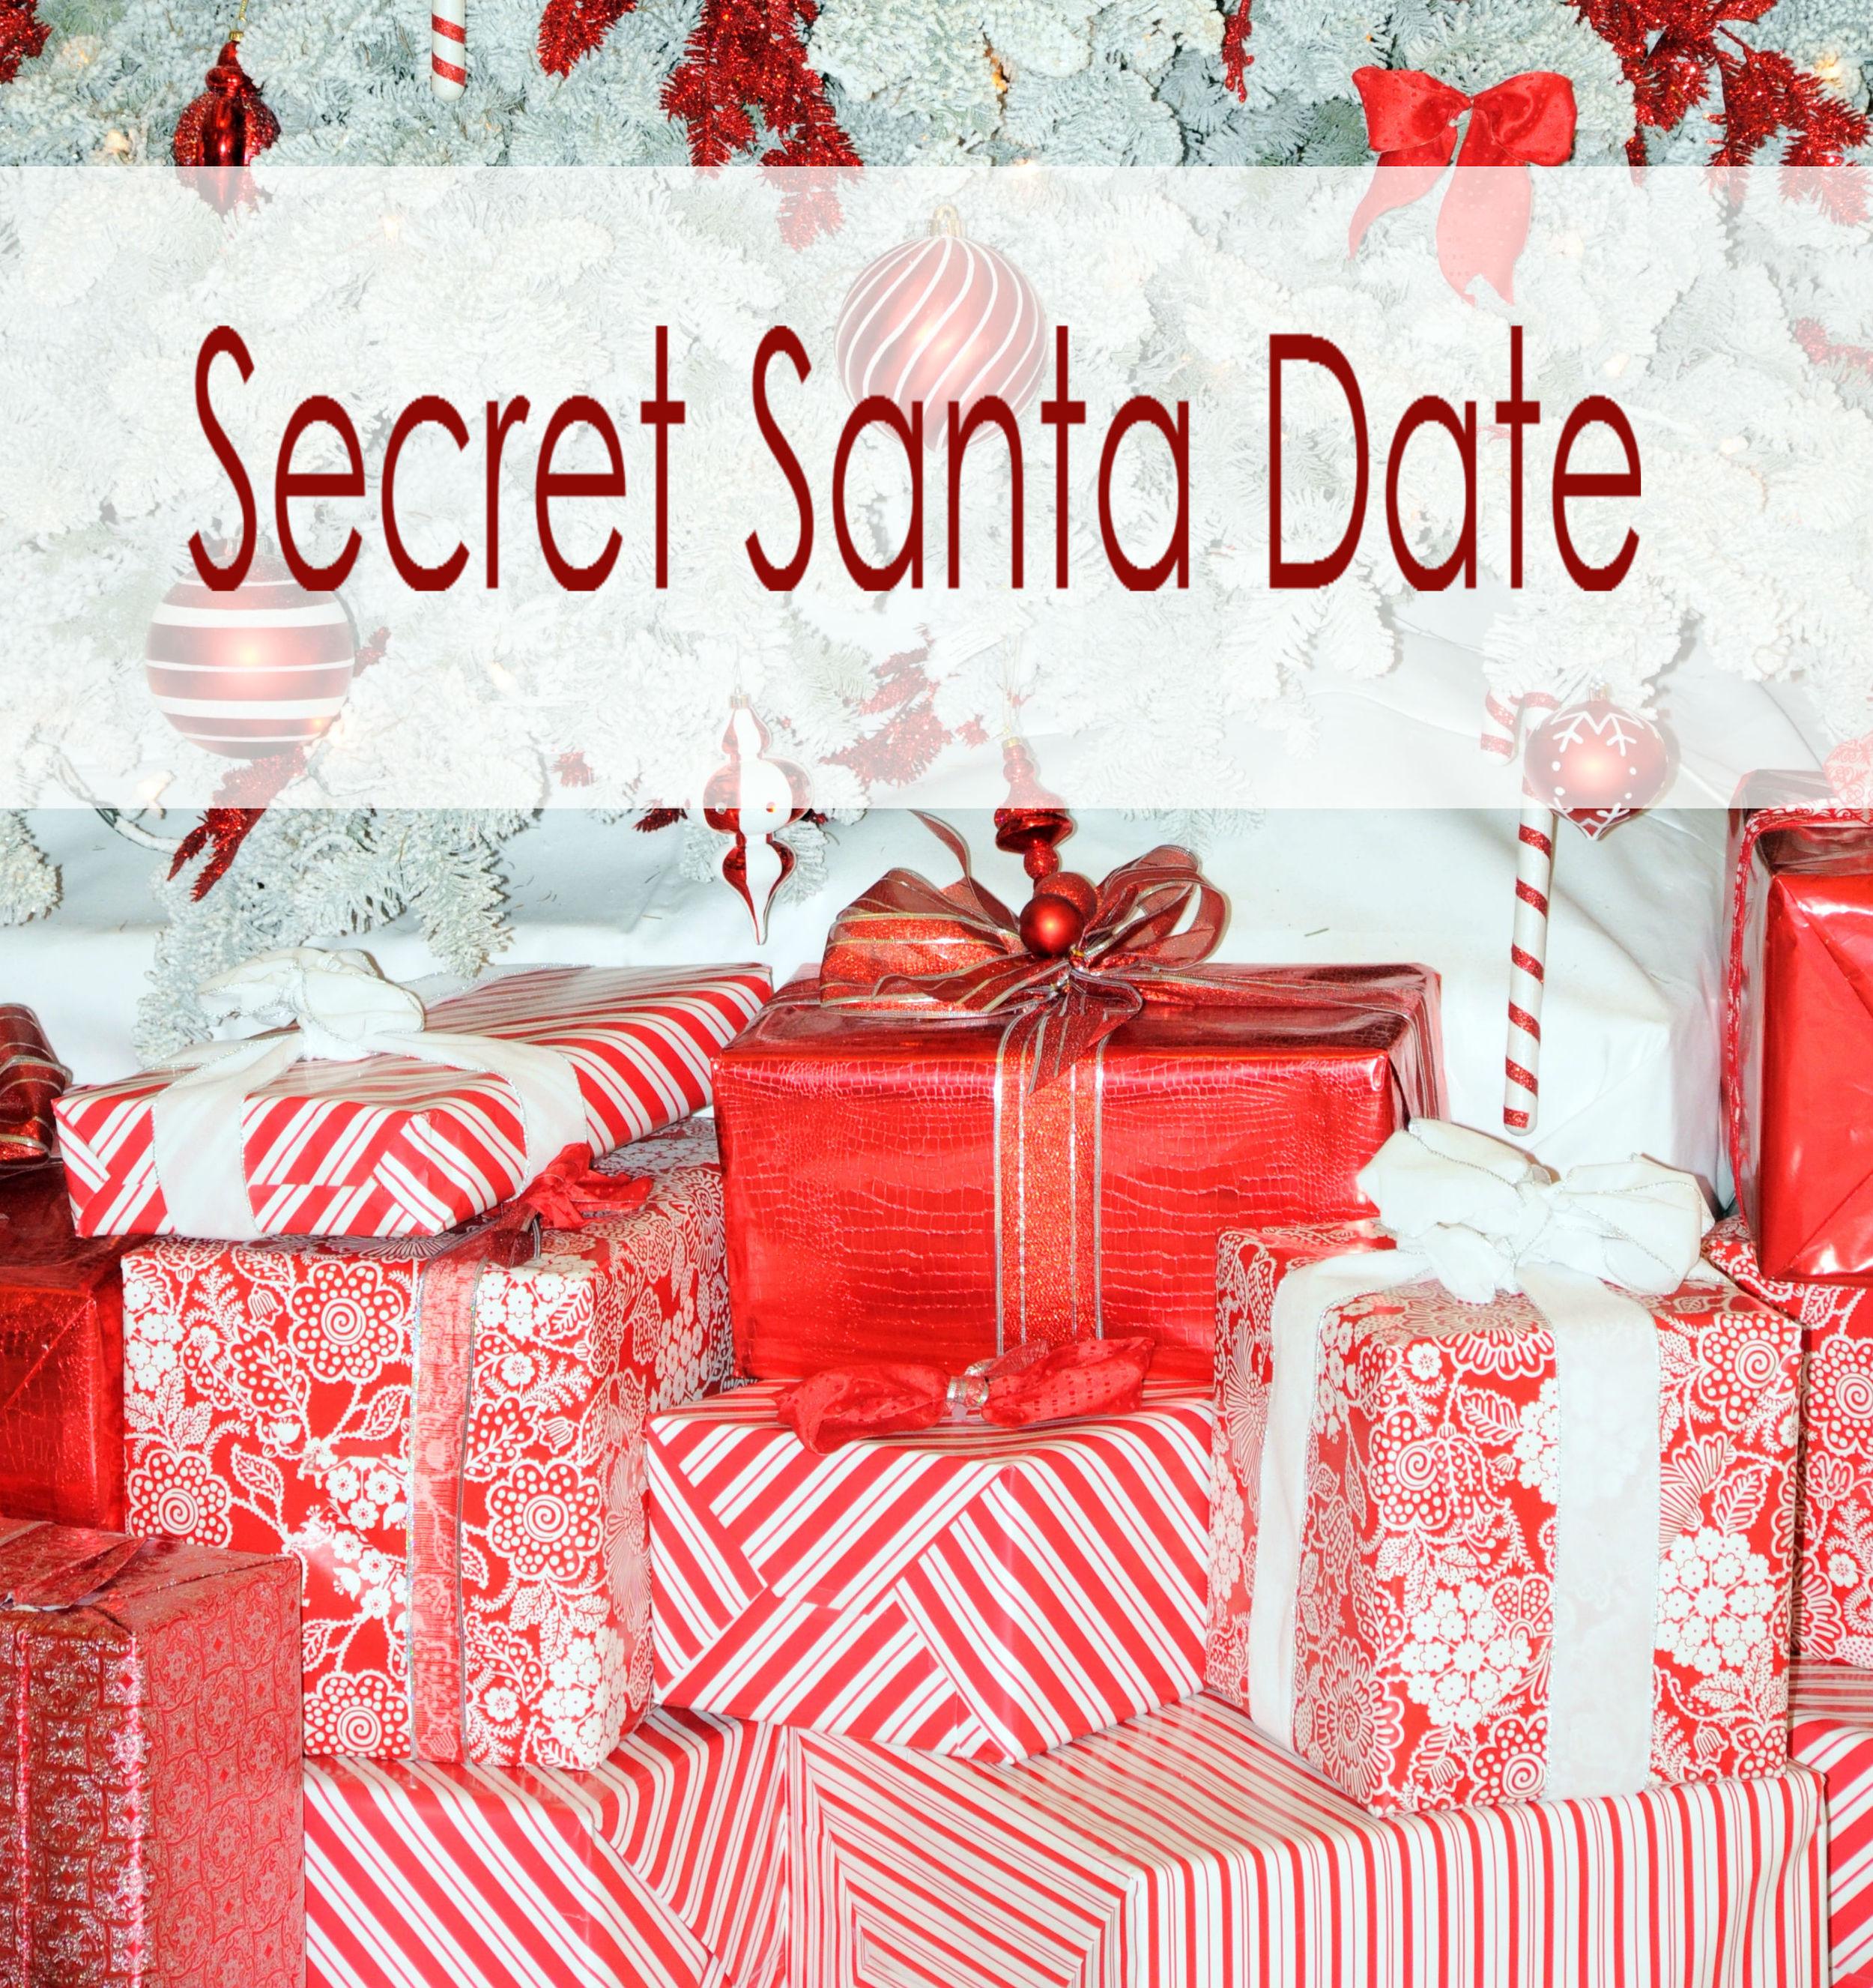 Secret Santa Date